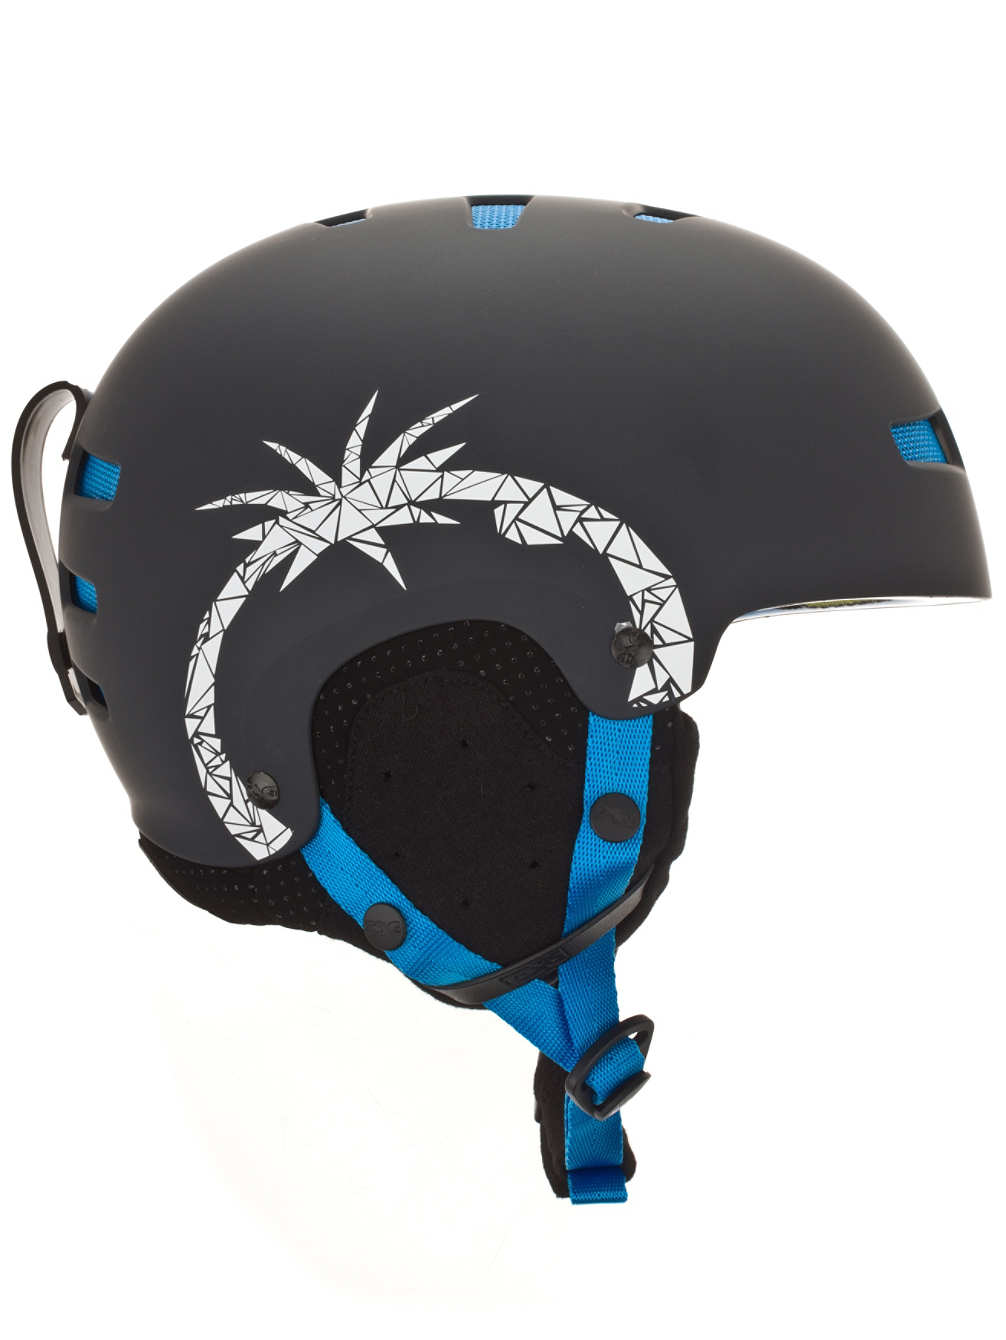 Gravity+Blue+Tomato+Helmet-3